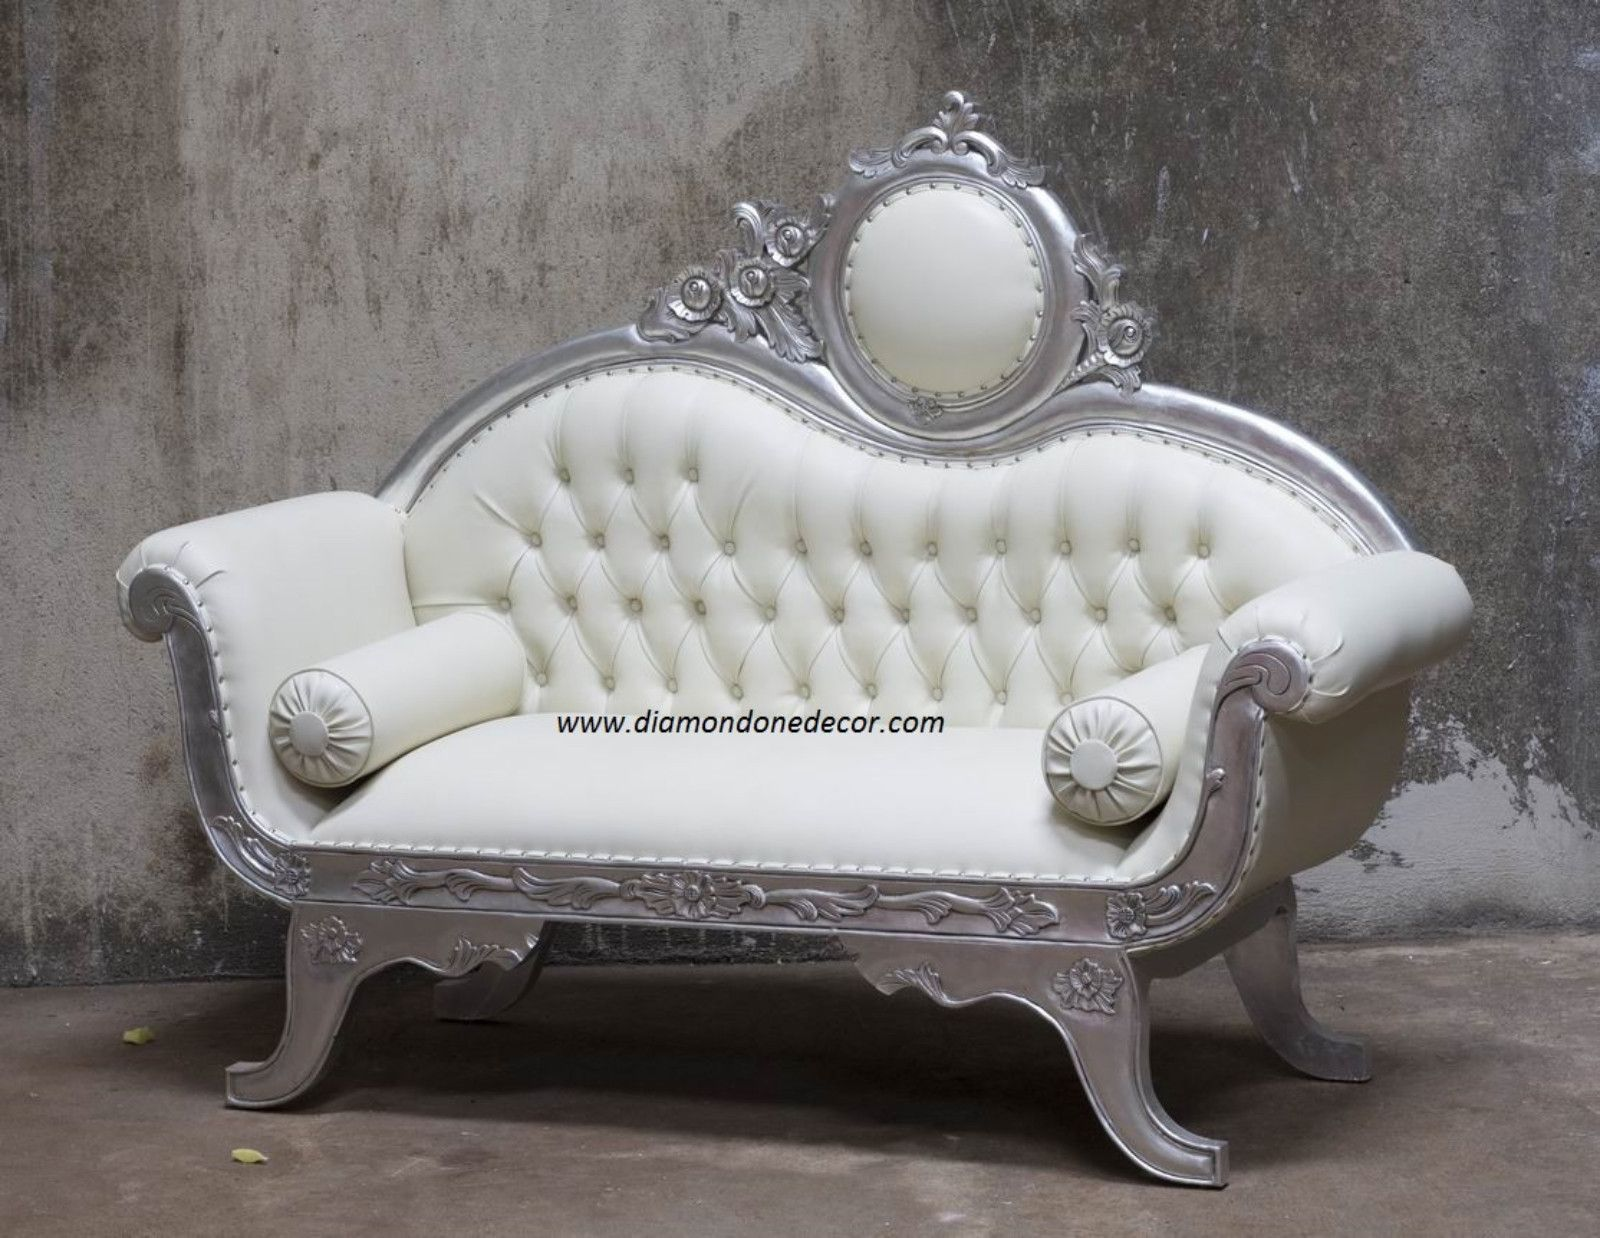 Luxury Baroque French Reproduction Rococo Victorian Wedding Louis